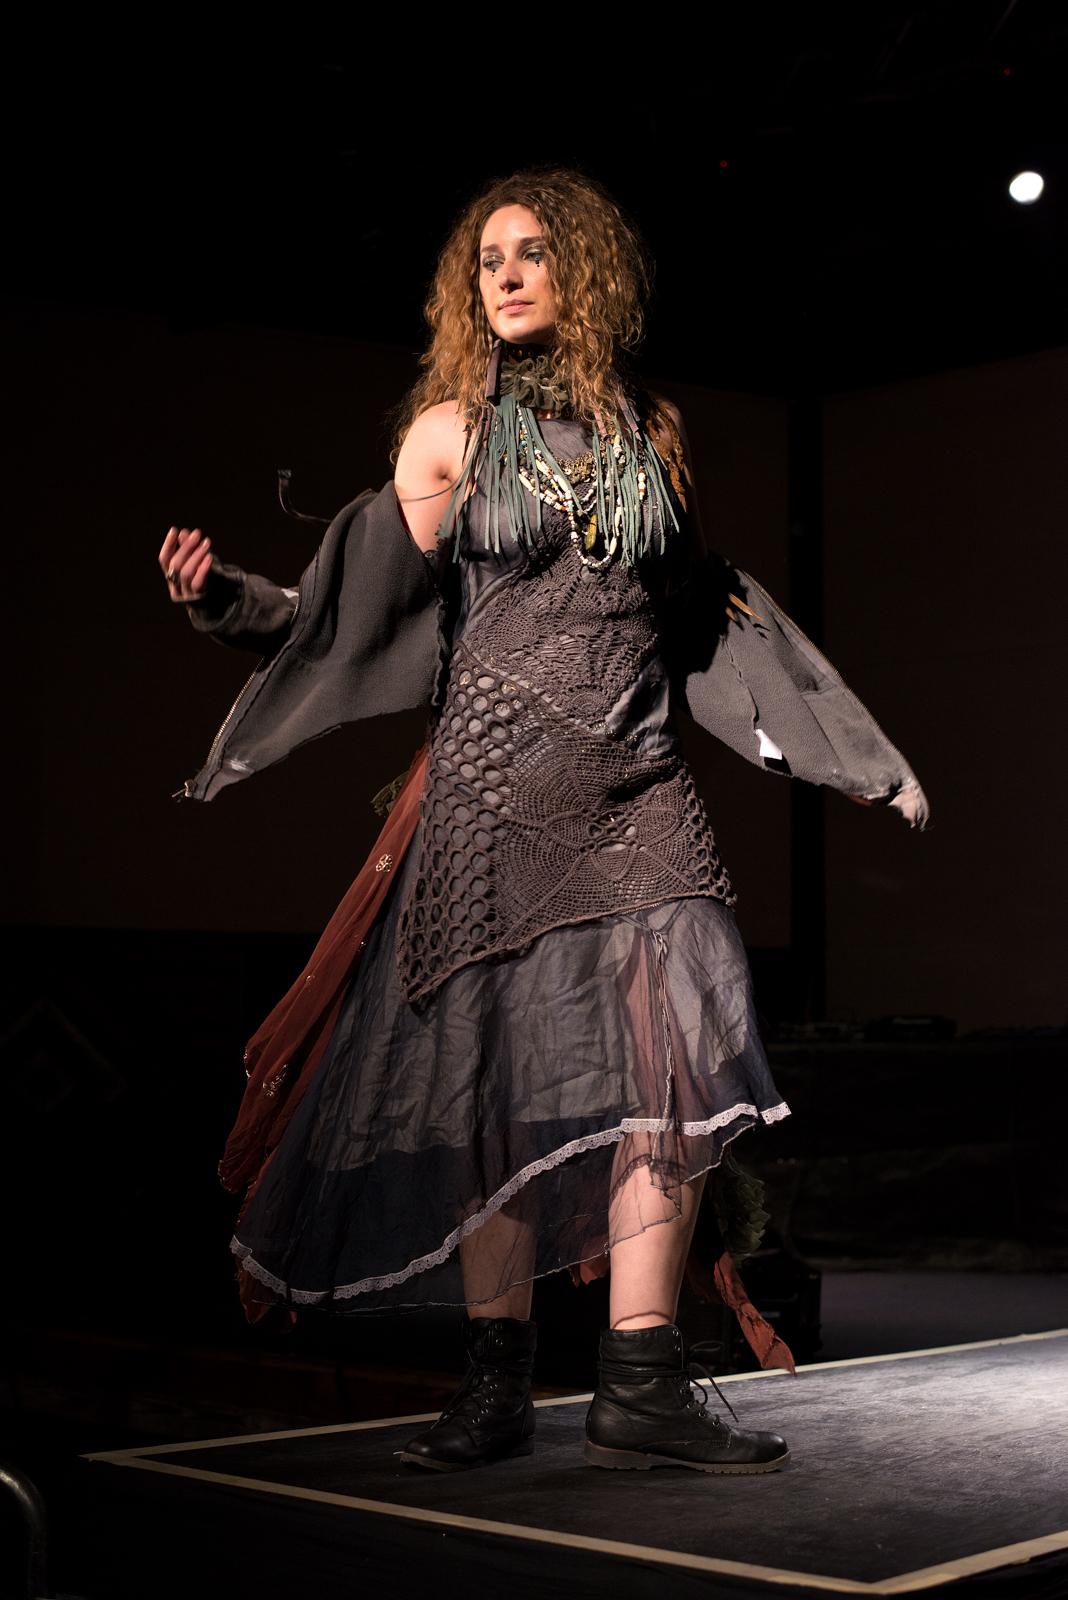 model: Jacquelyn Shook